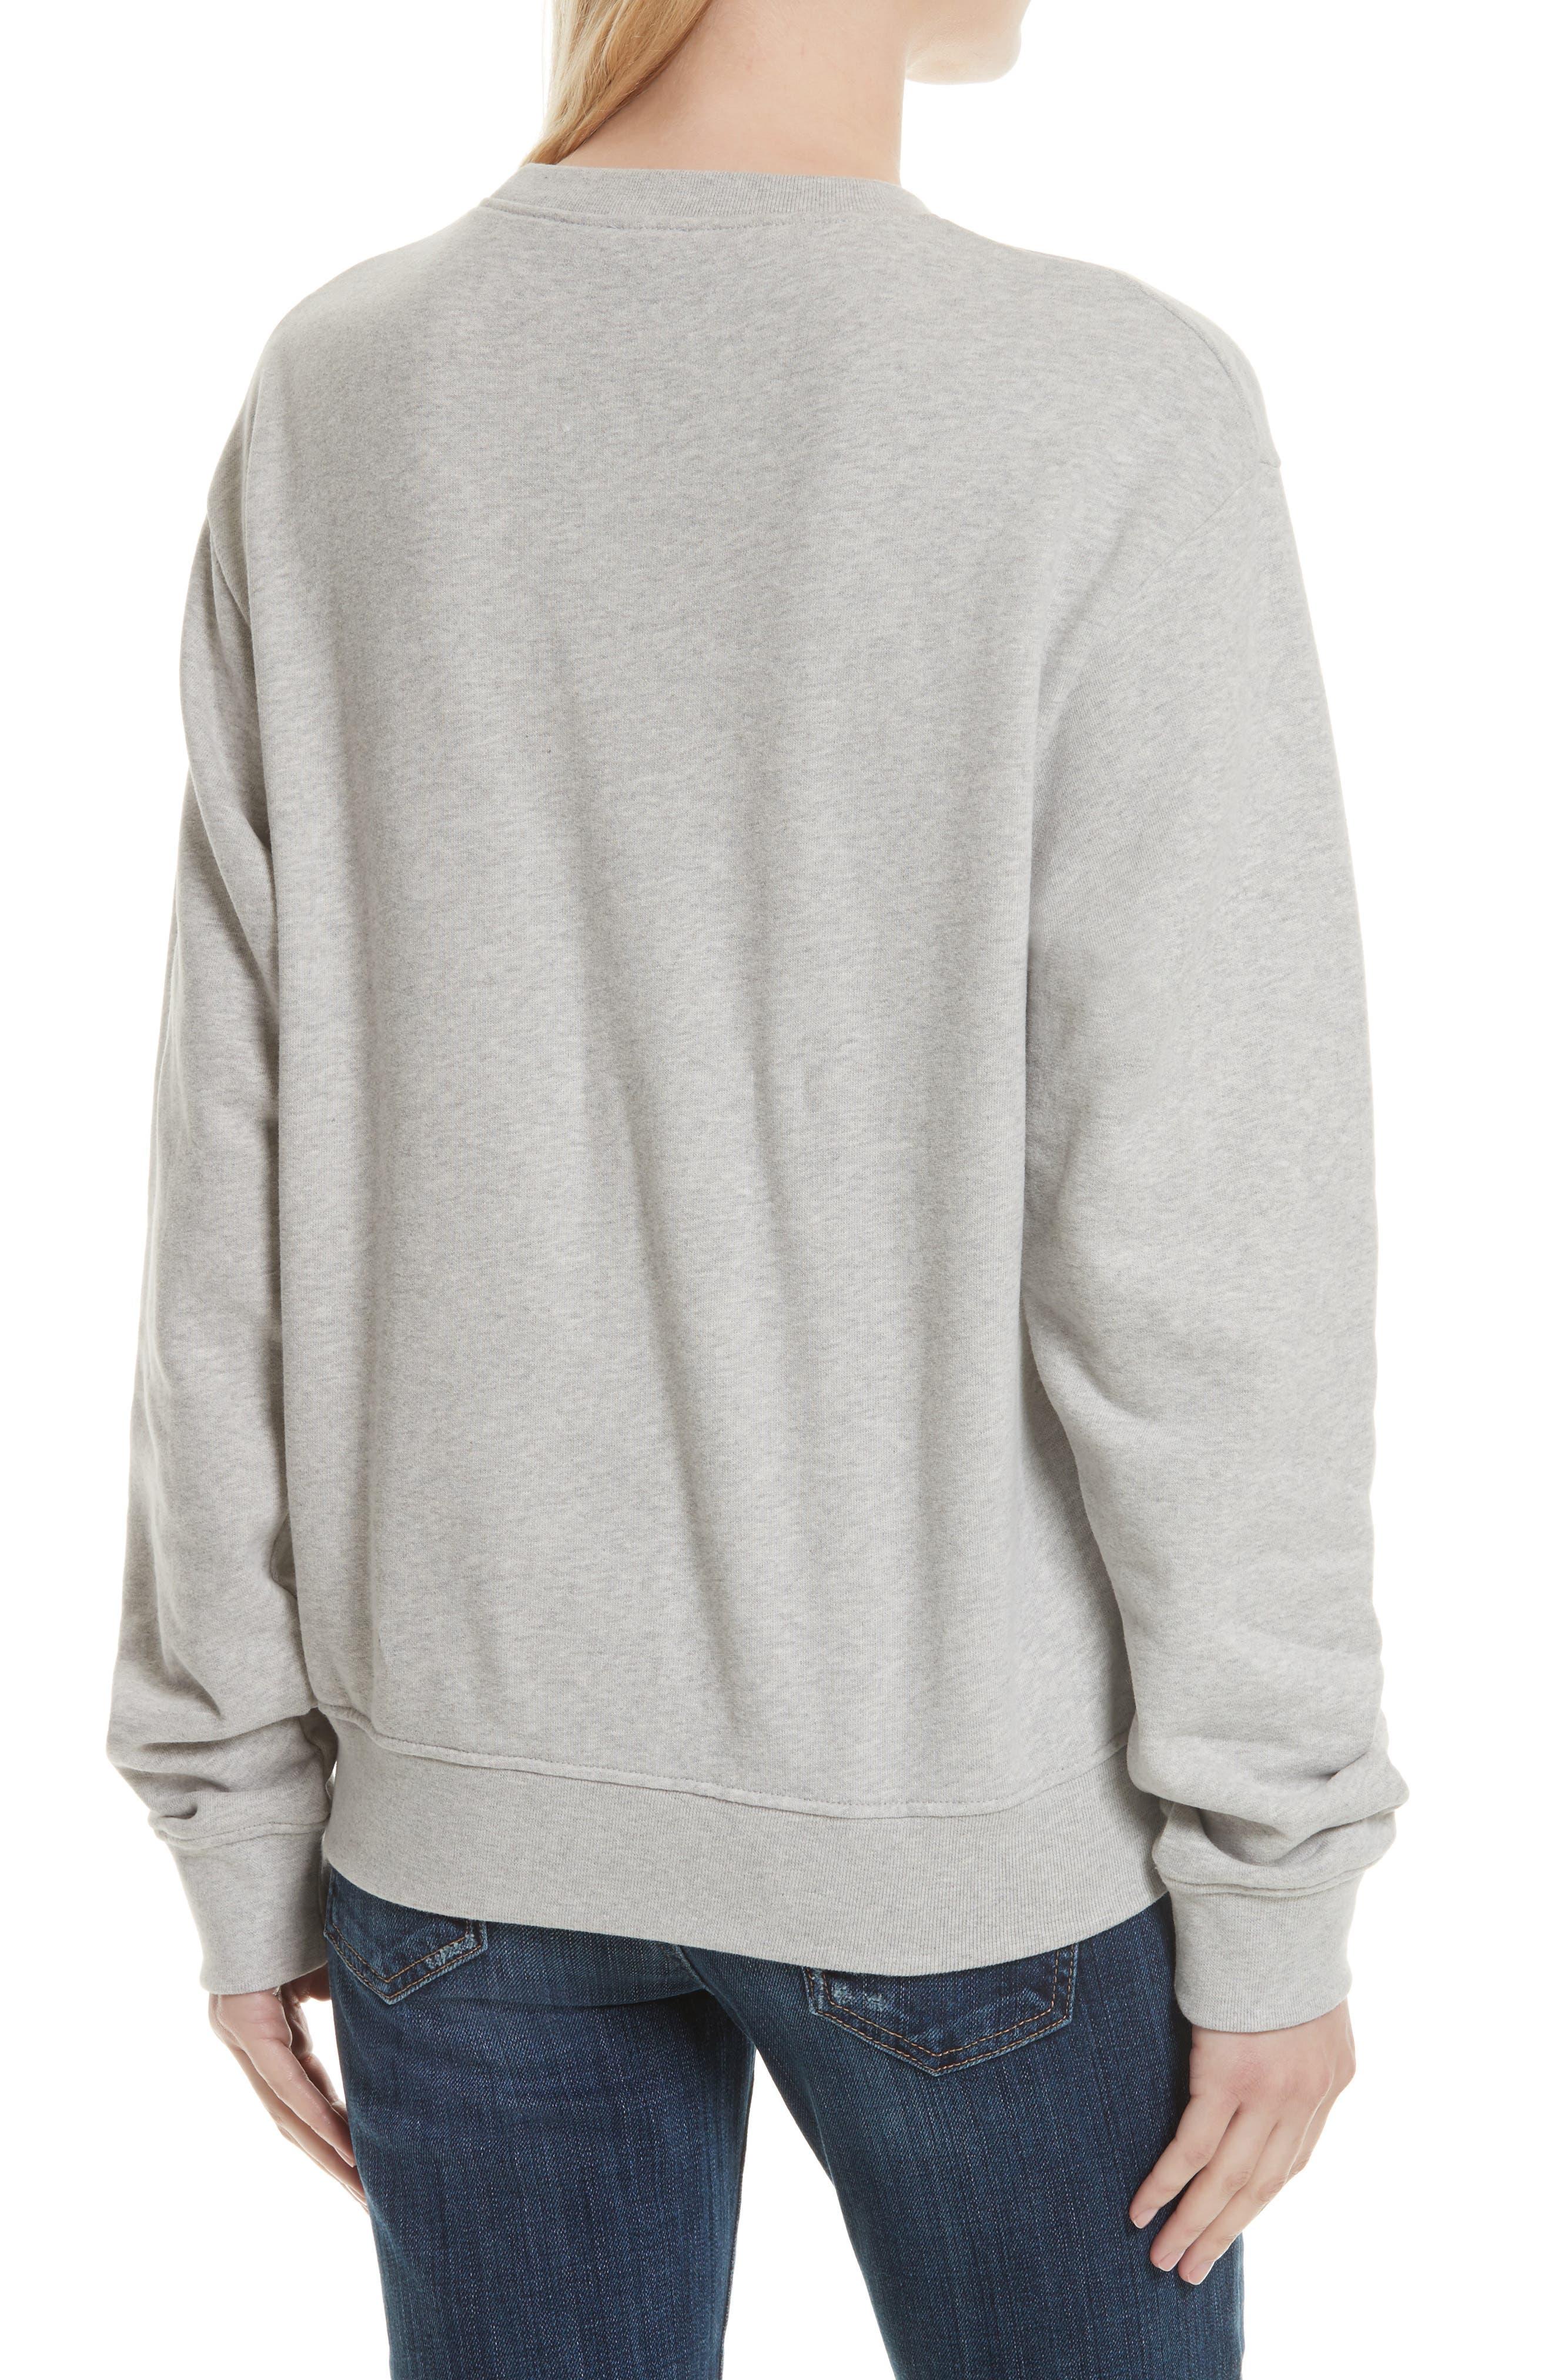 Cotton Sweatshirt,                             Alternate thumbnail 2, color,                             HEATHER GREY